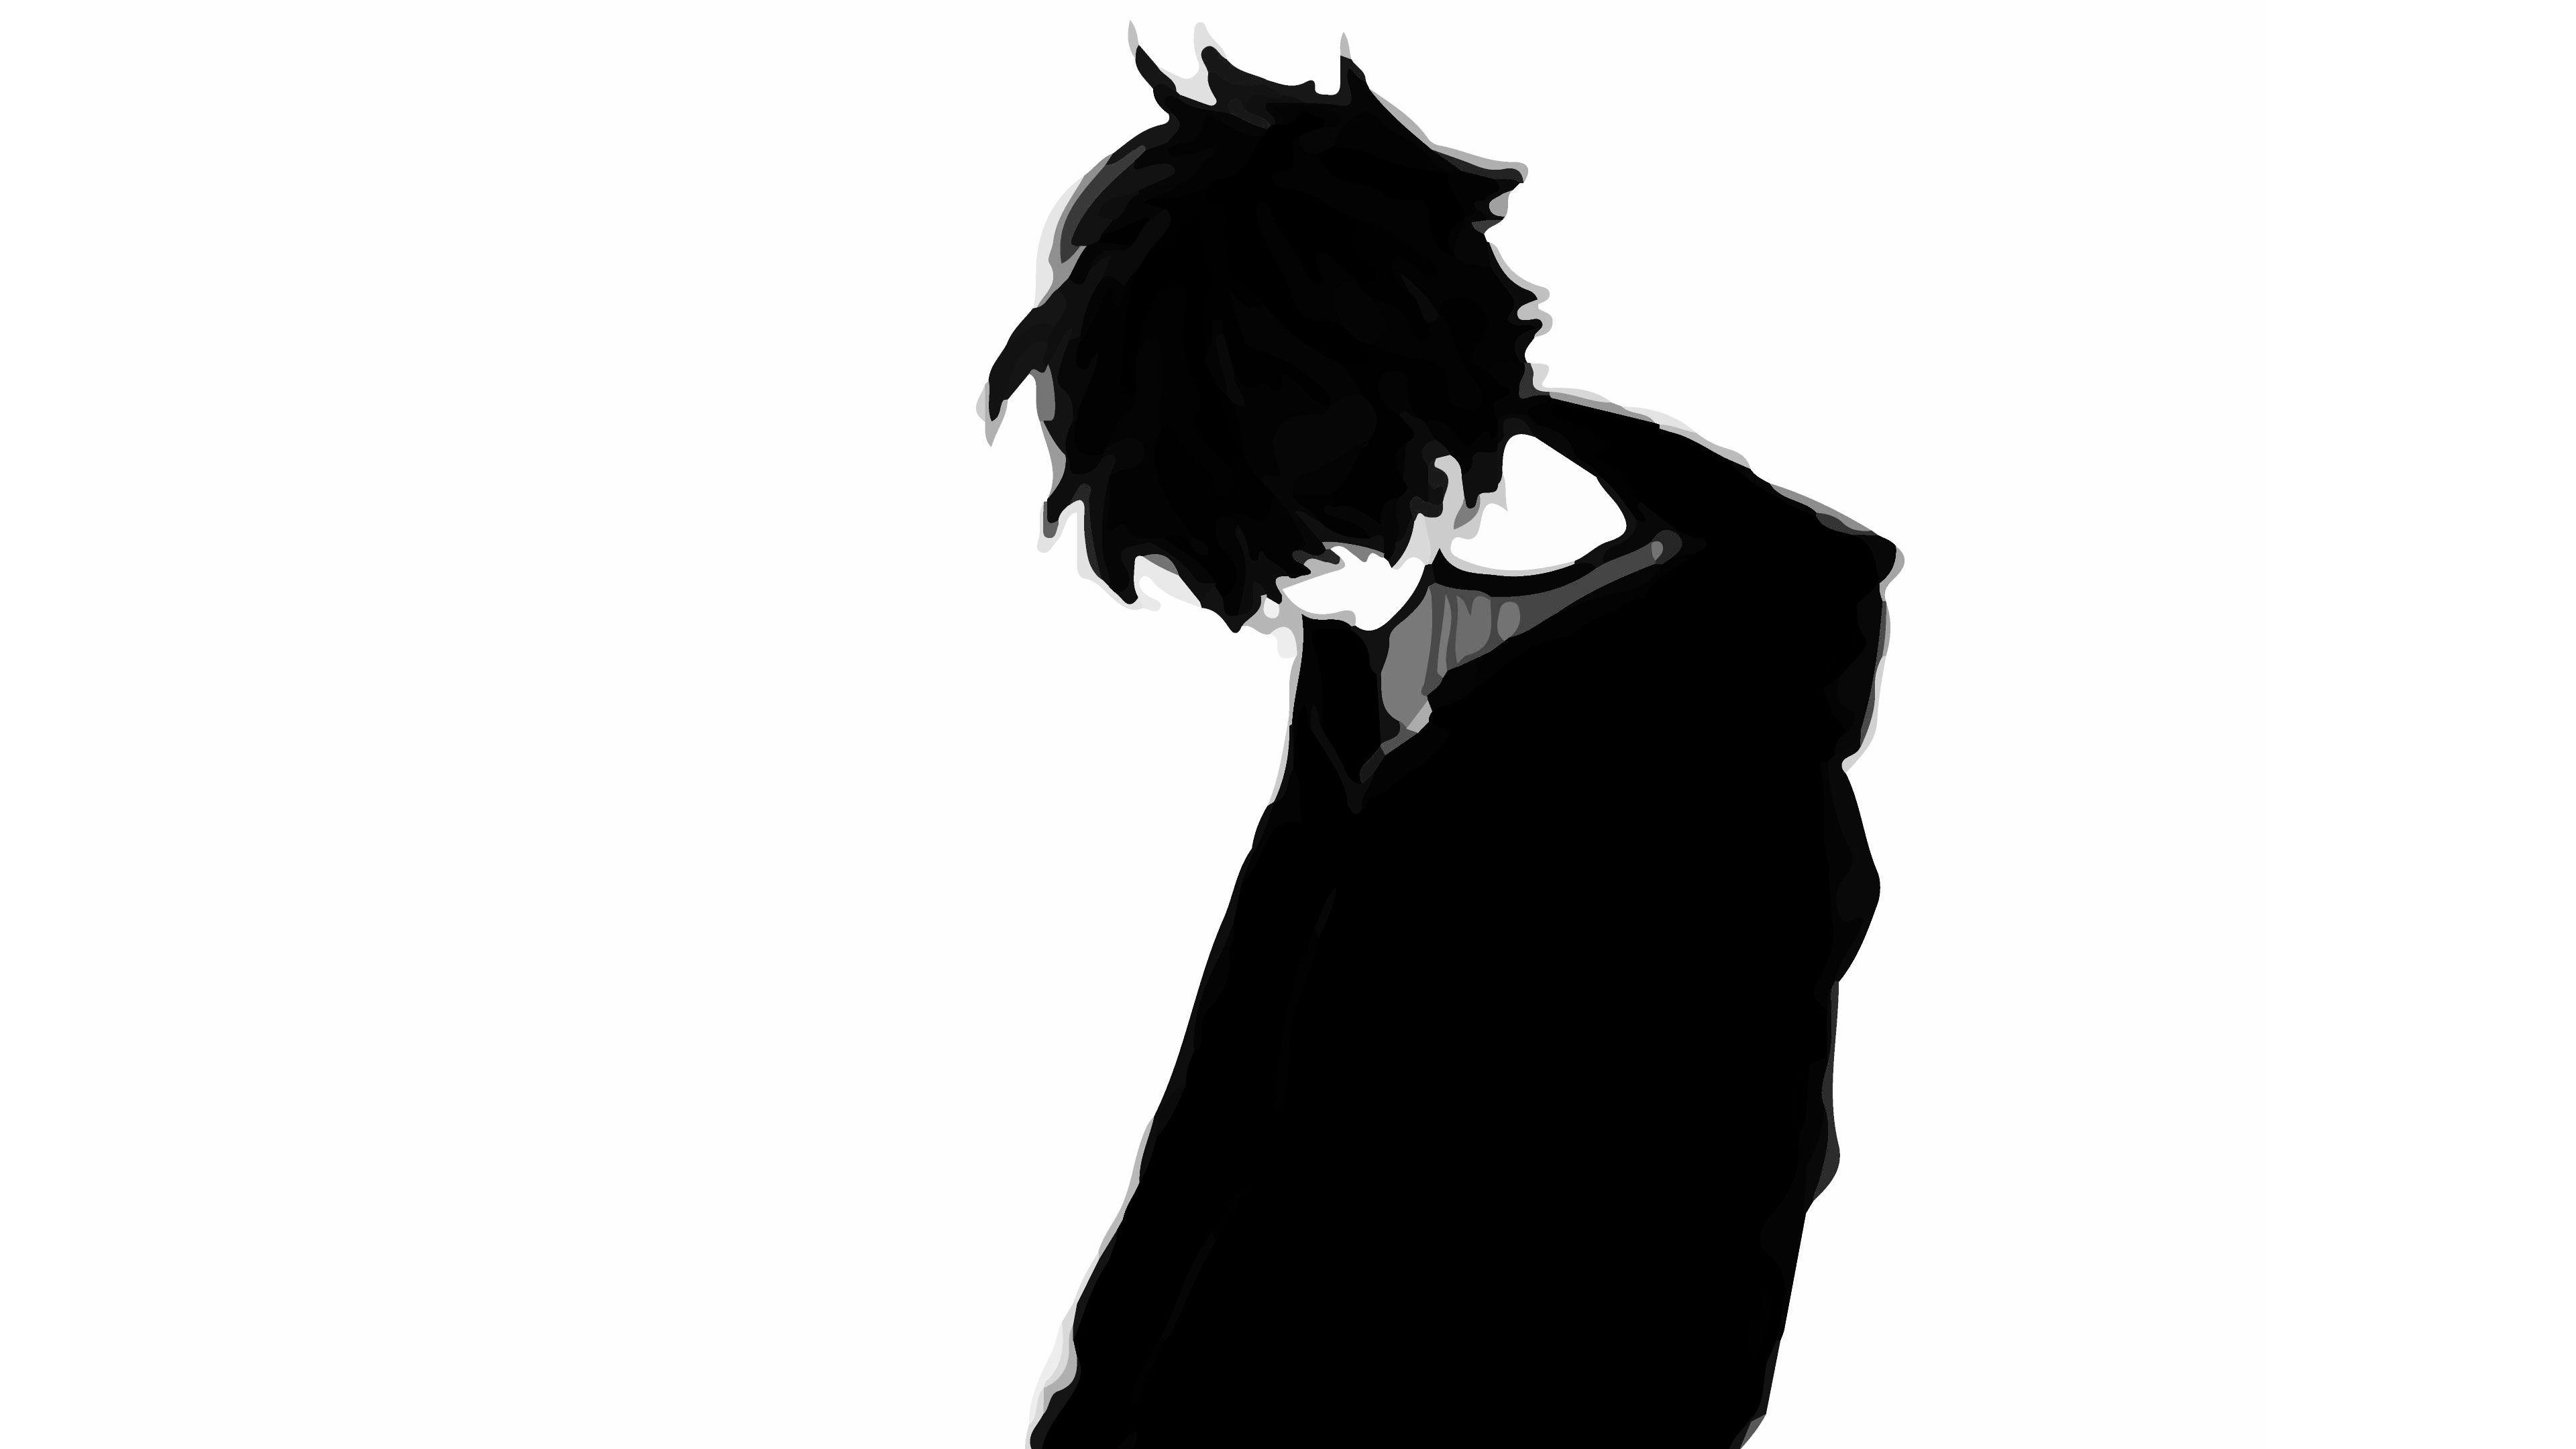 Pin by Mizuky Zukulyna on anime boys Pinterest Sad